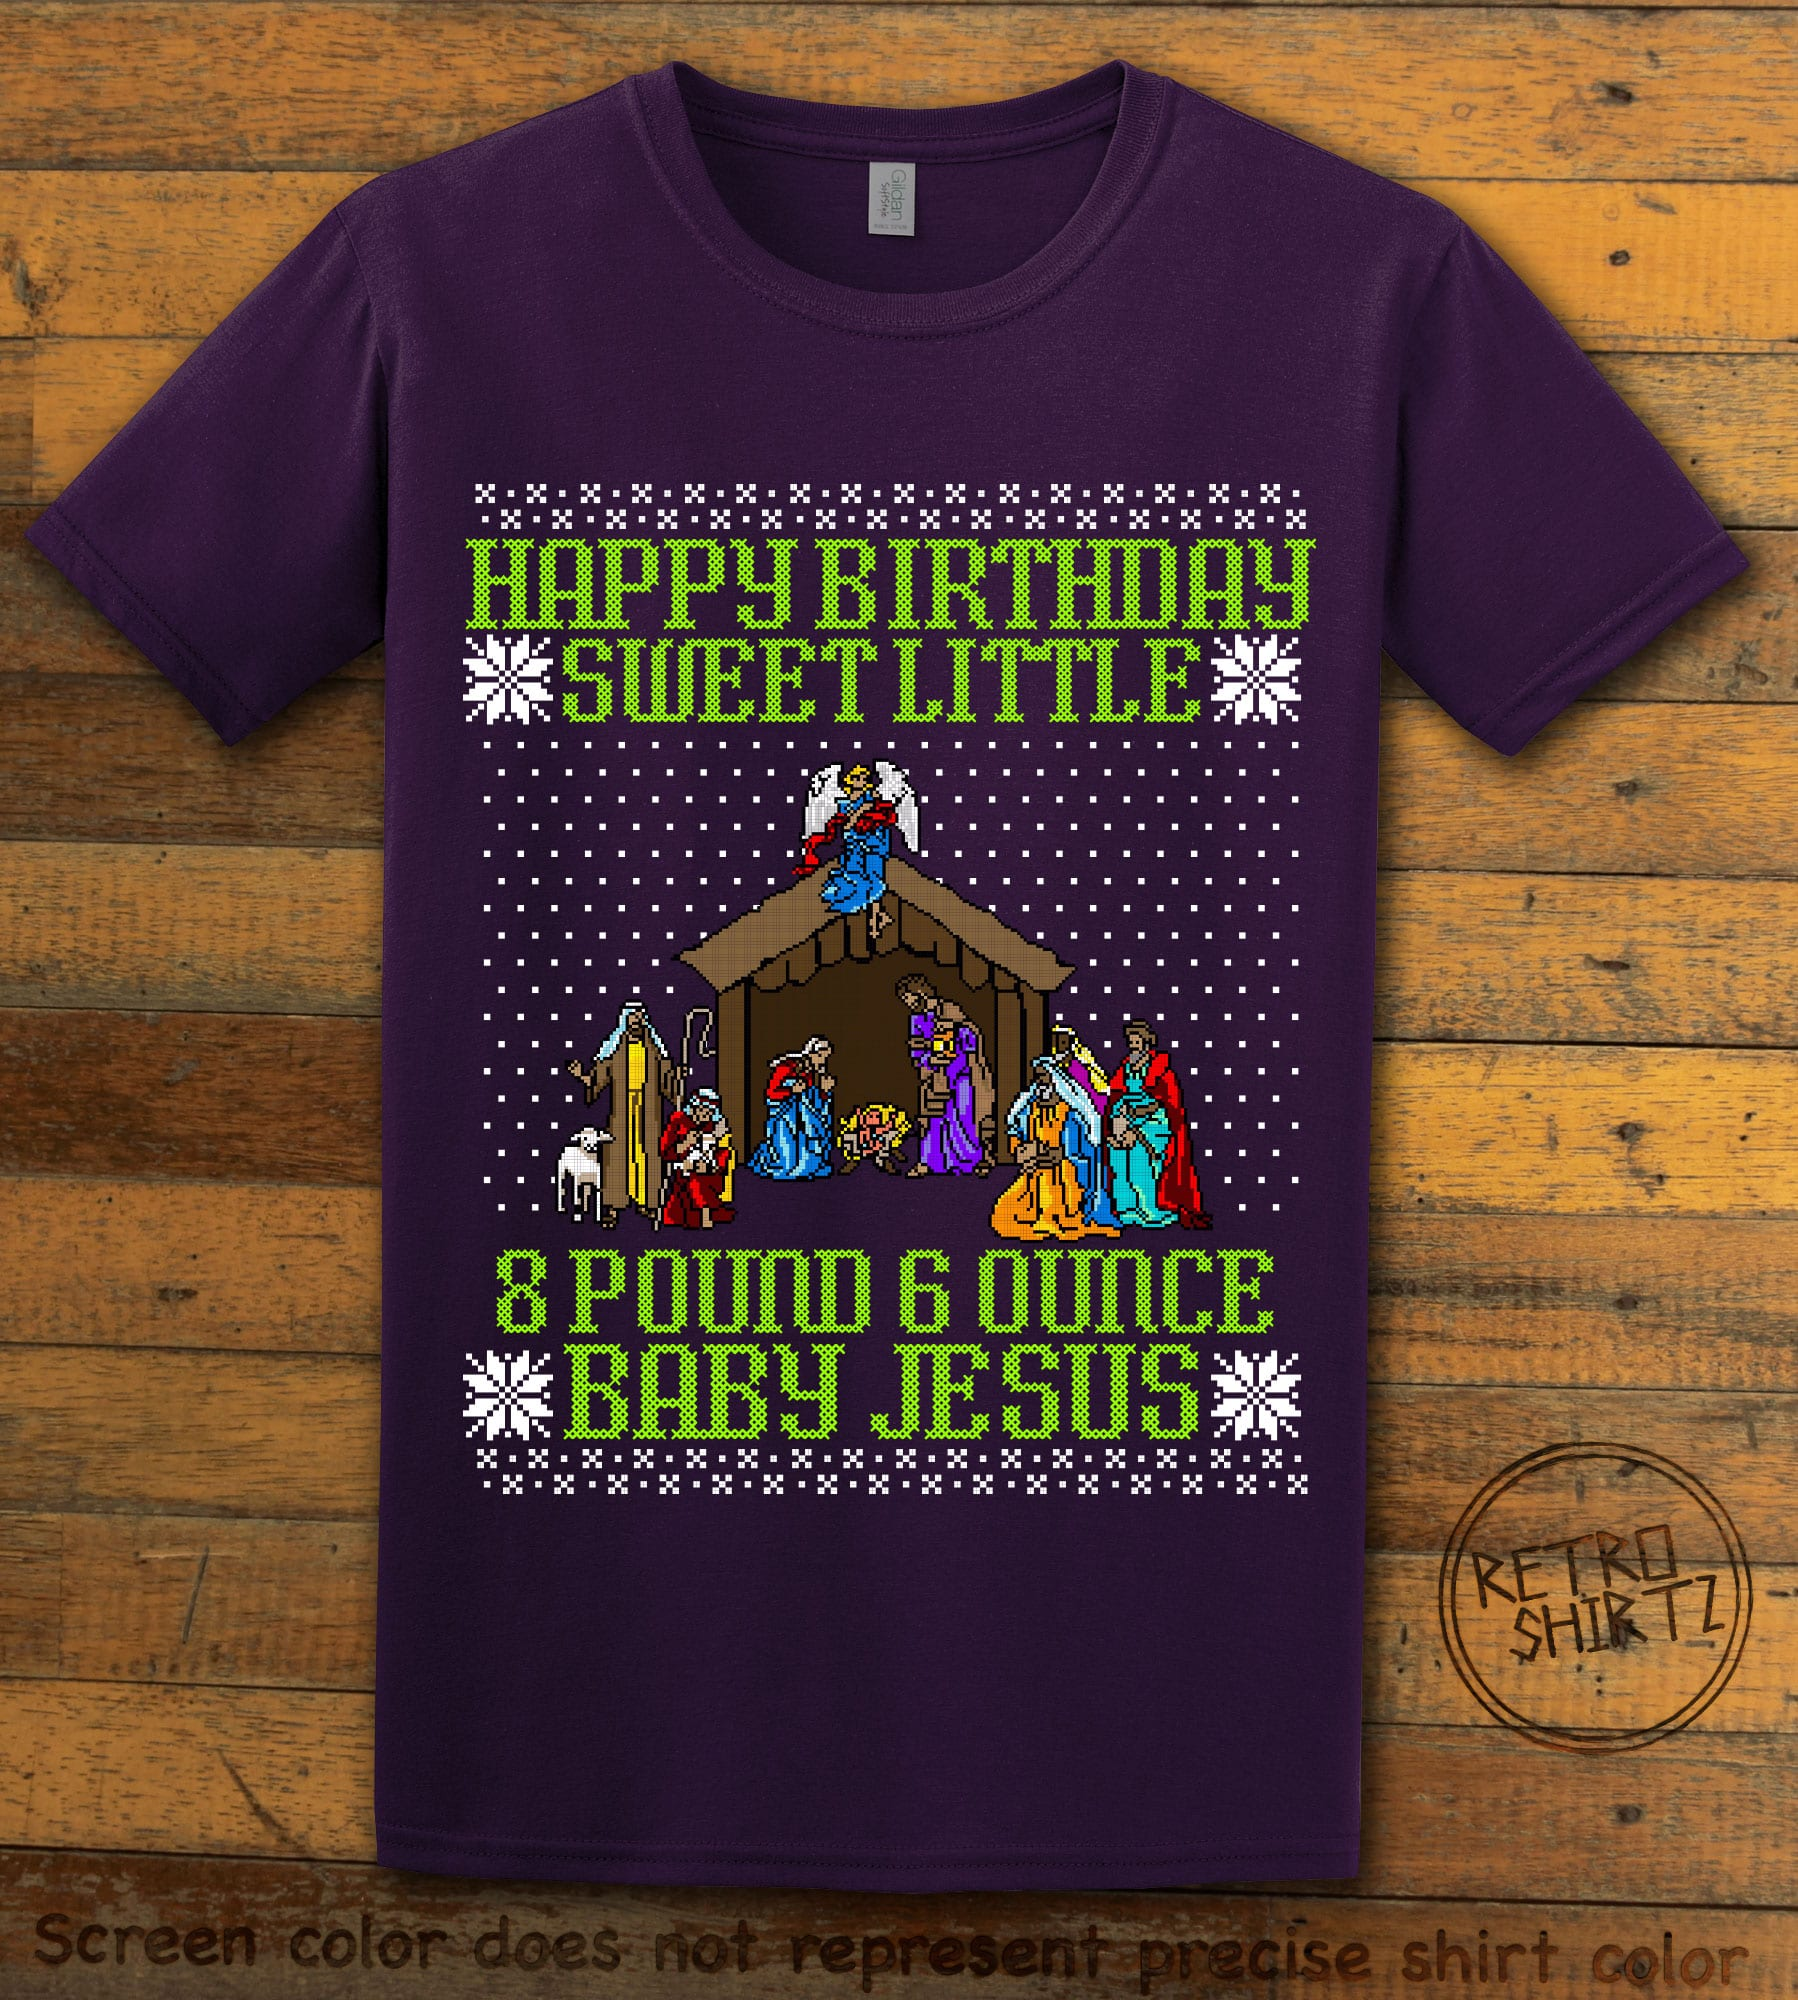 Happy Birthday Sweet Little Baby Jesus Christmas Graphic T-Shirt - purple shirt design